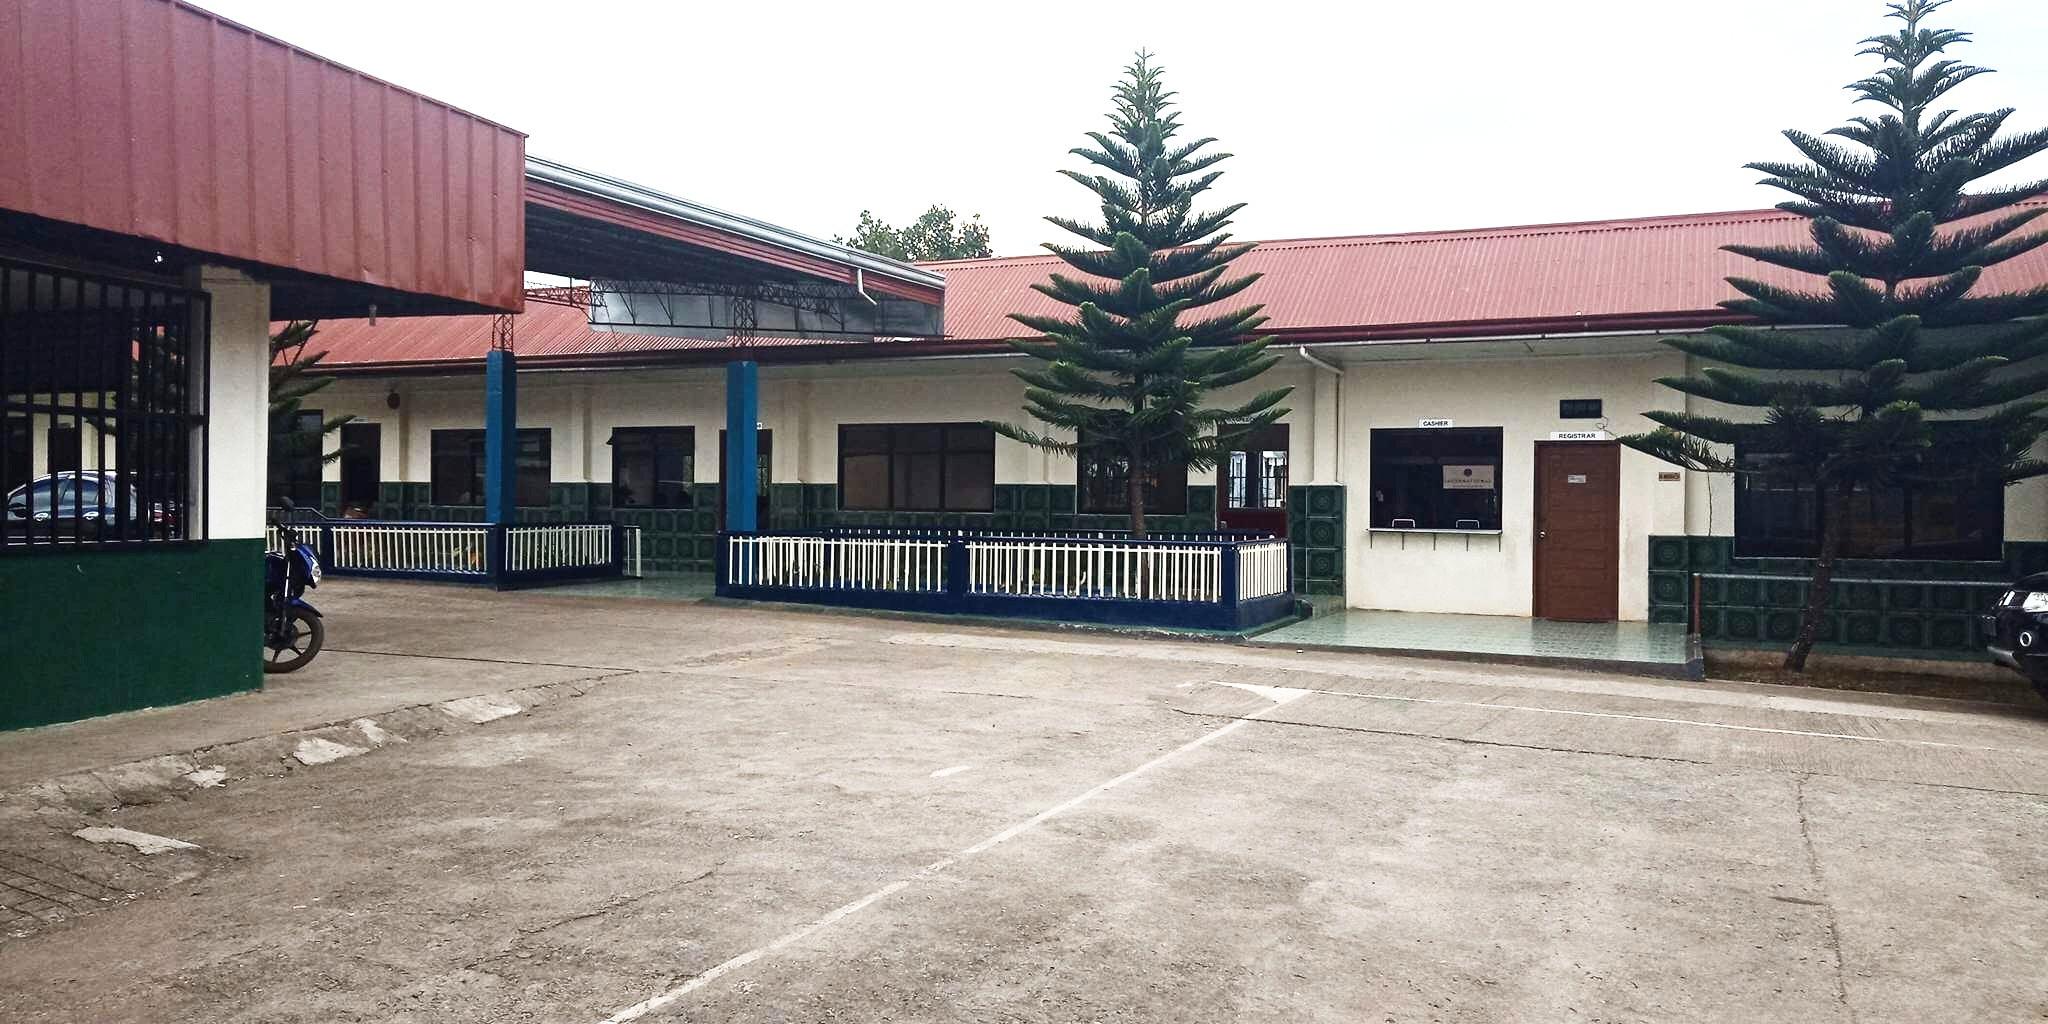 Tour of the School